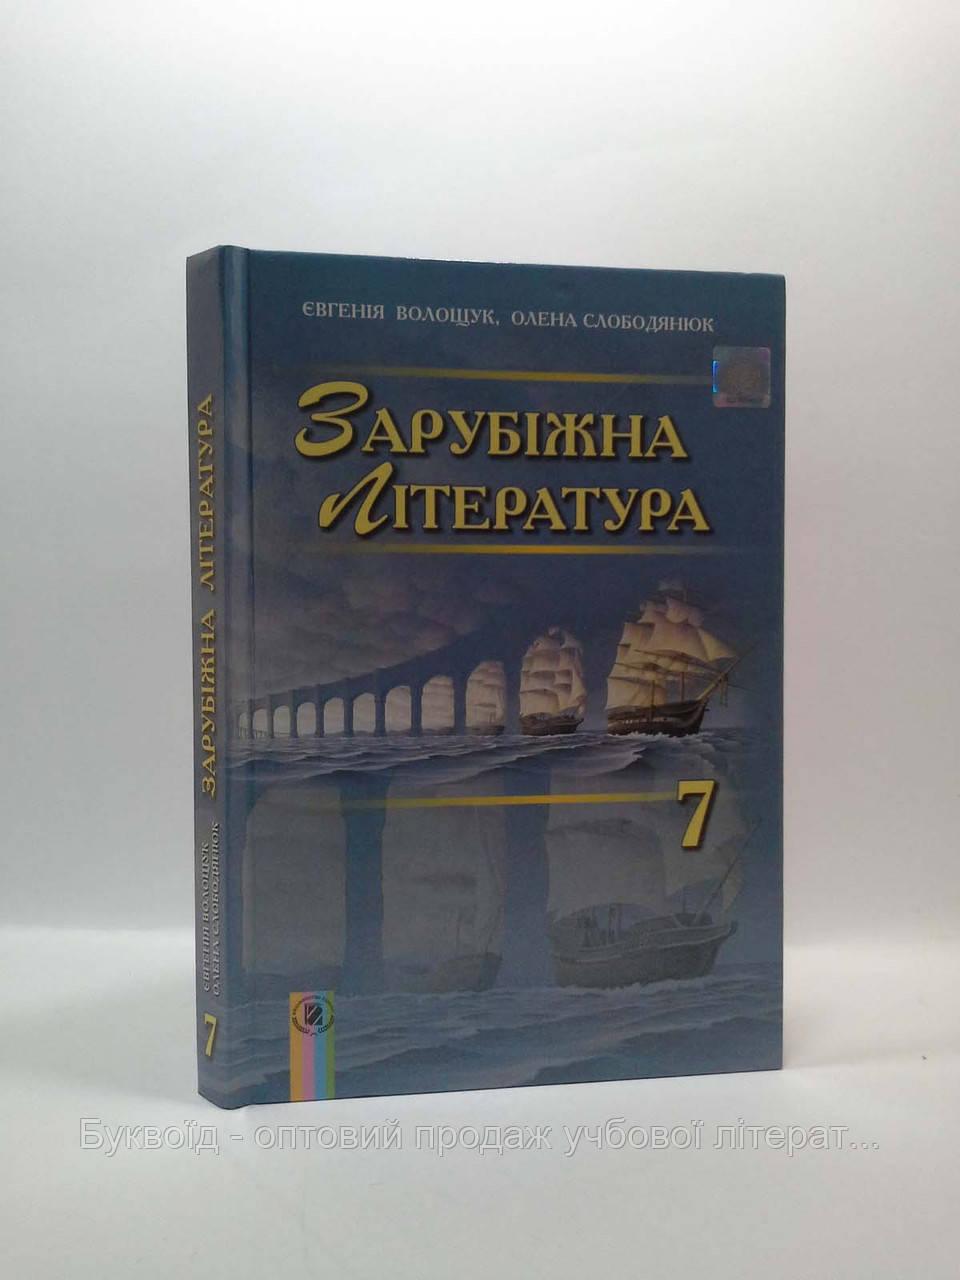 Зарубіжна література 7 клас Підручник  Волощук Генеза ISBN 978-966-11-0601-6